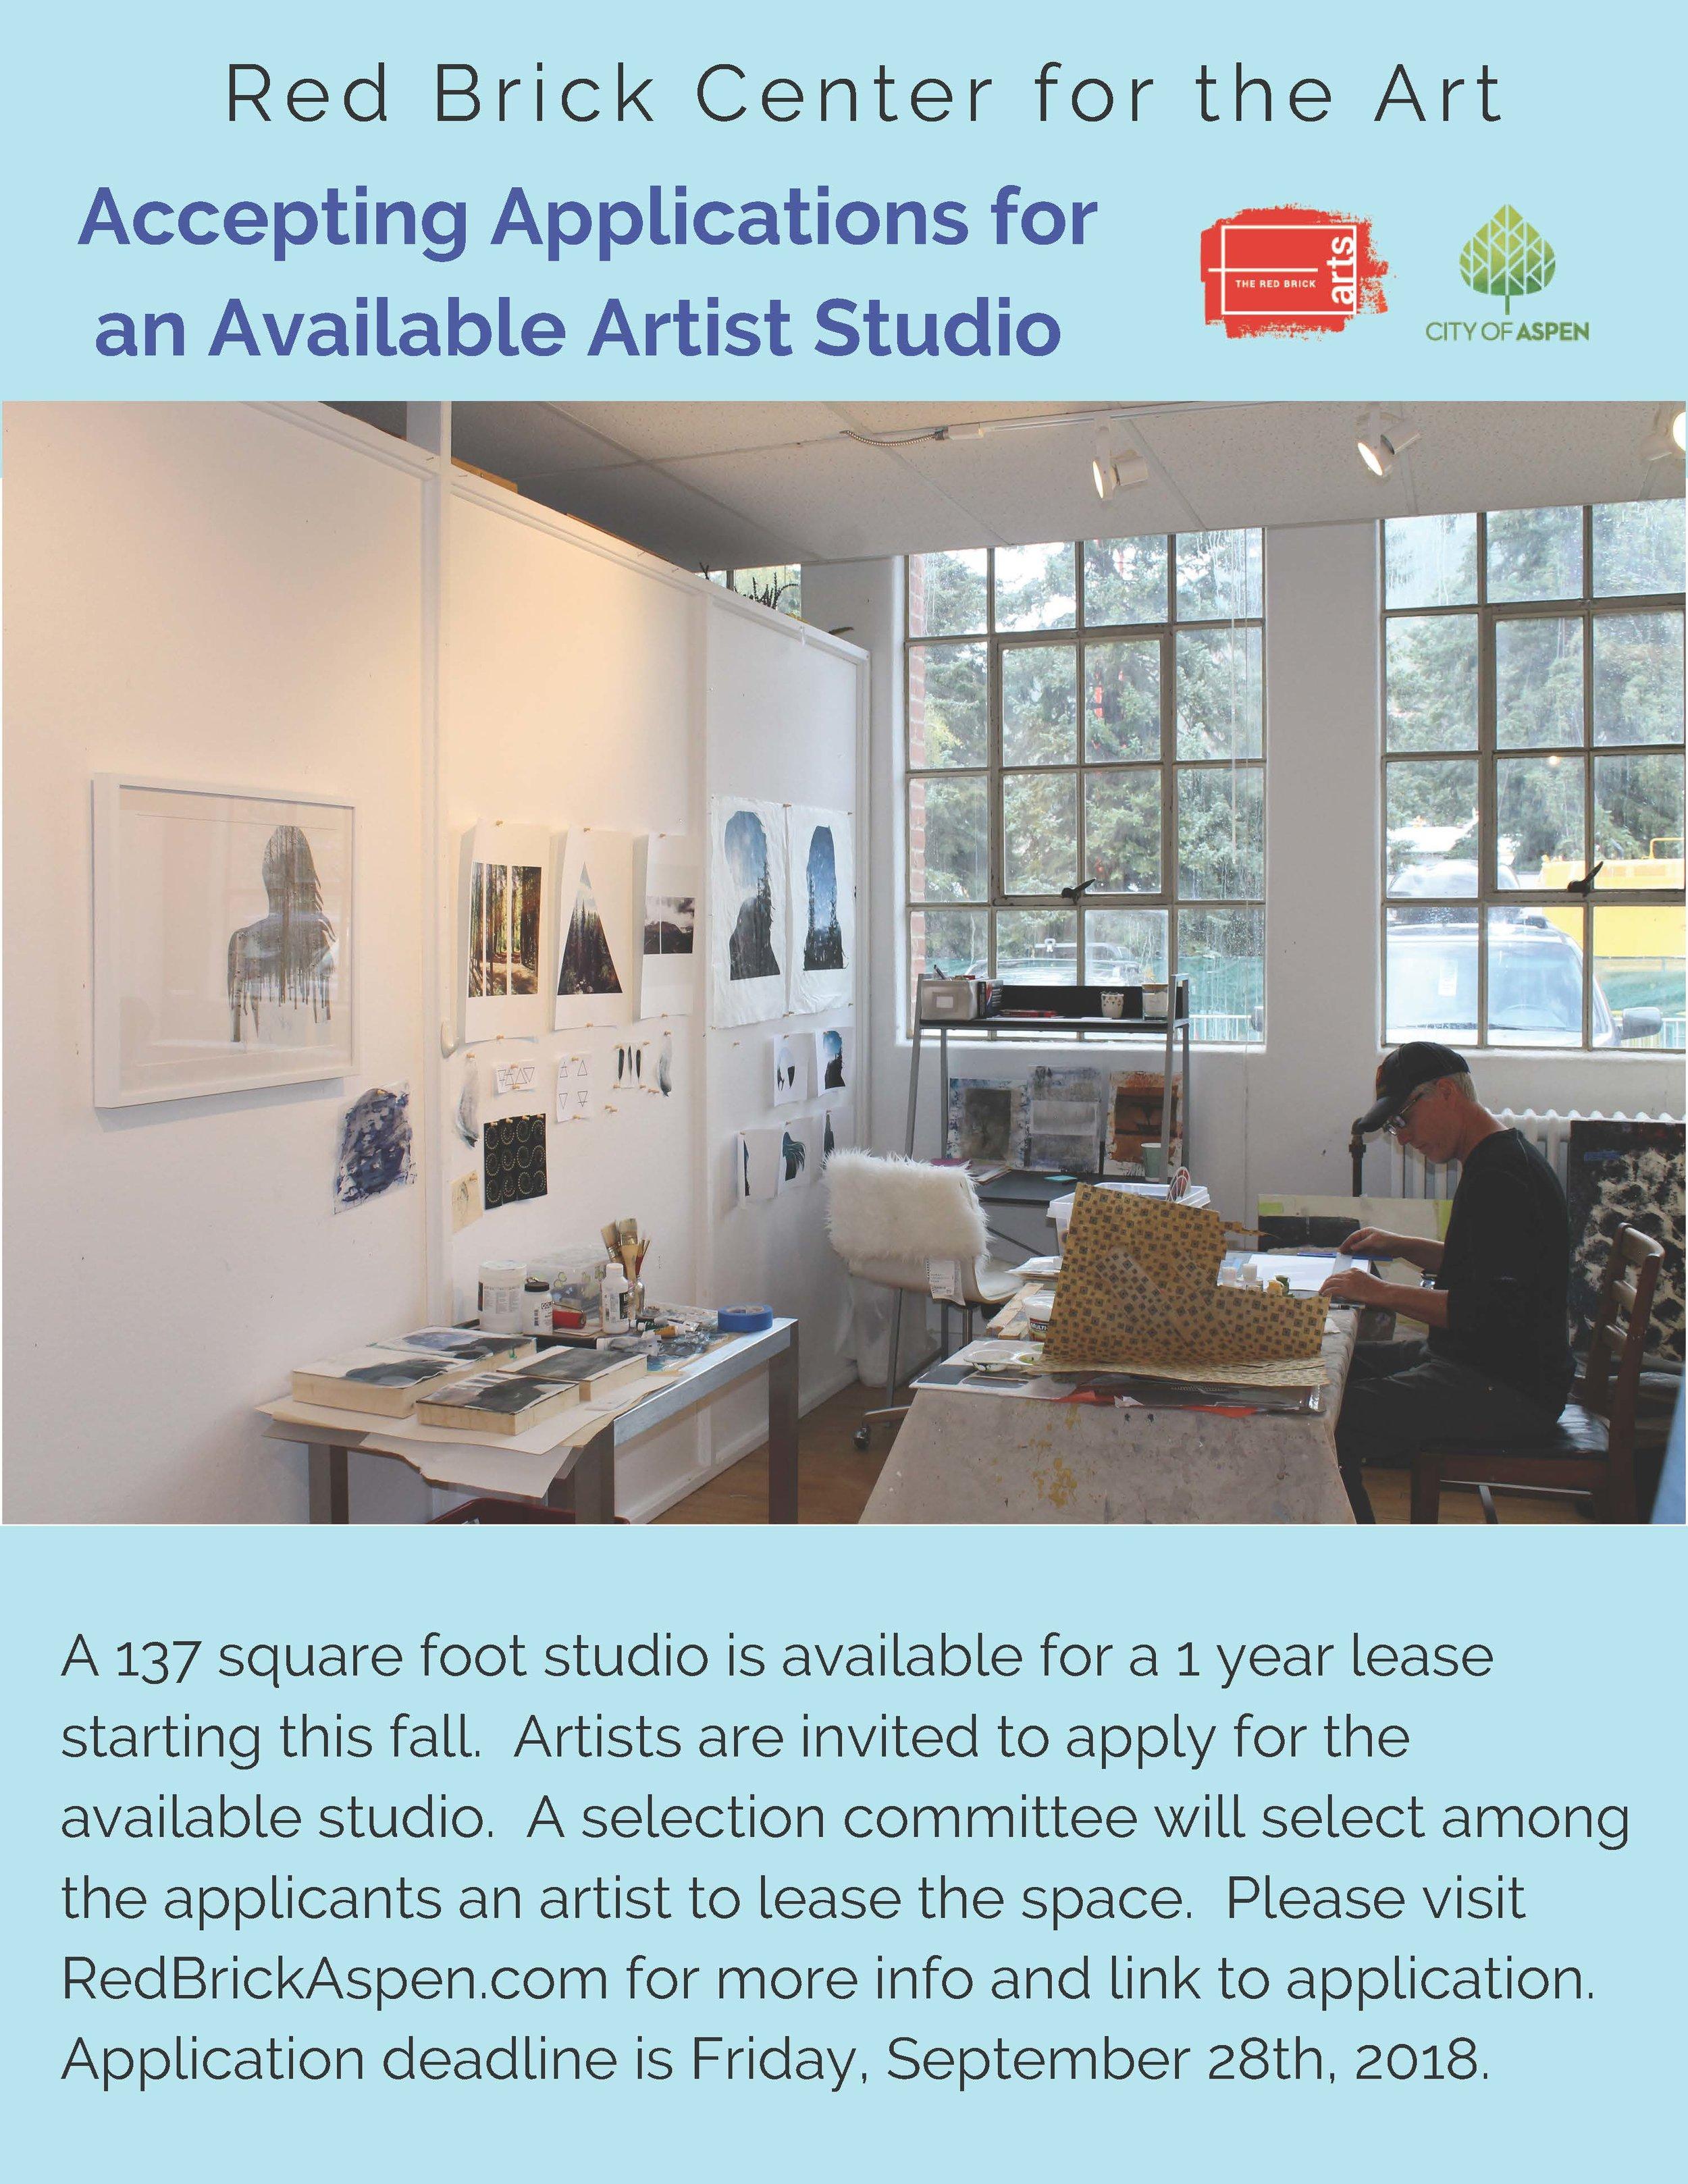 Available Studio - Call for Artist Applicants jpeg.jpg